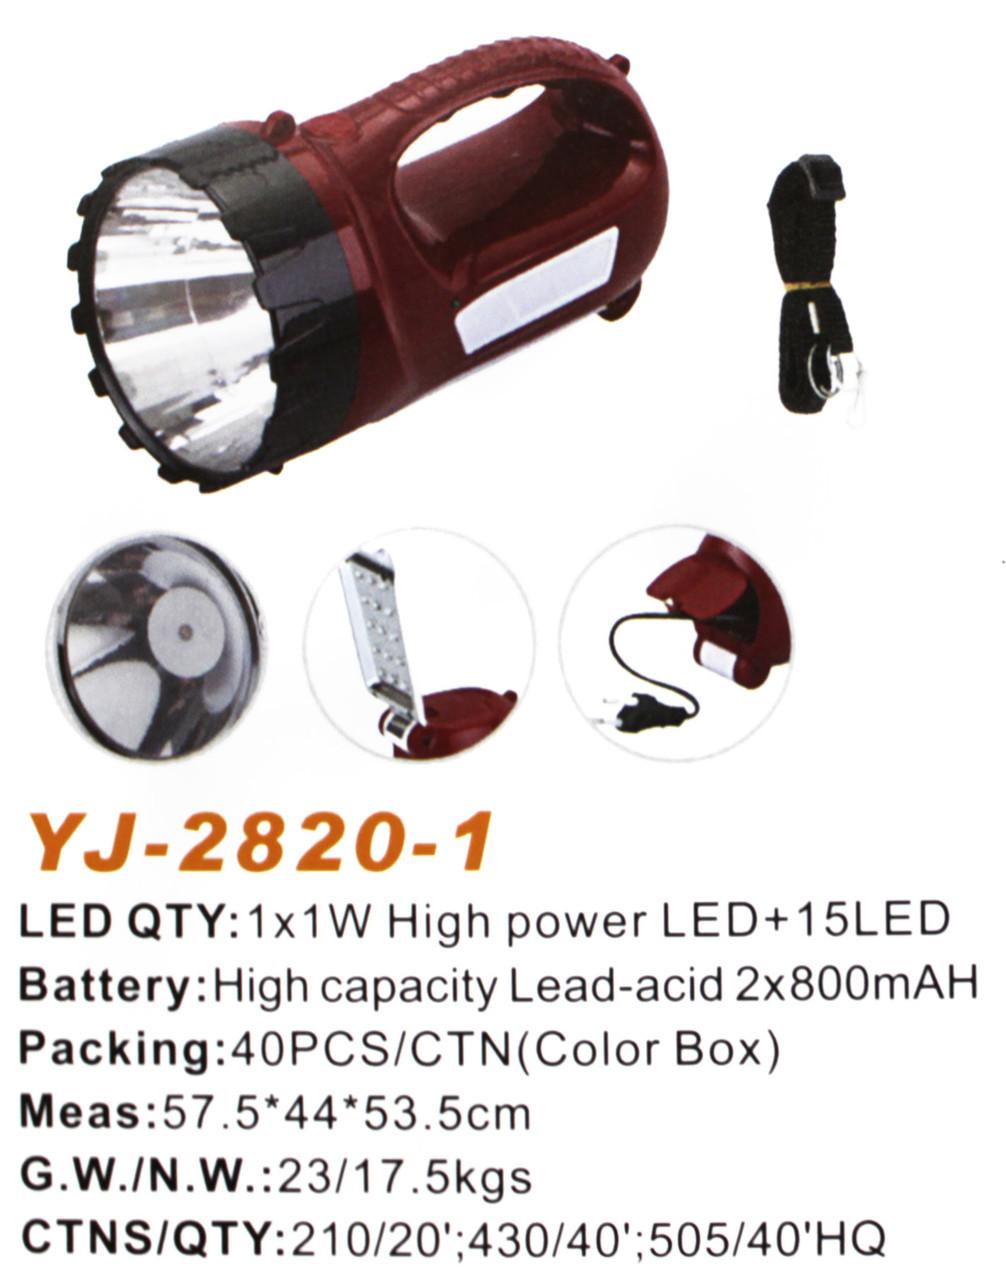 Фонарь Yajia YJ-2820-1/Акк./ 1 LED+19 LED/ Боковая подсветка/